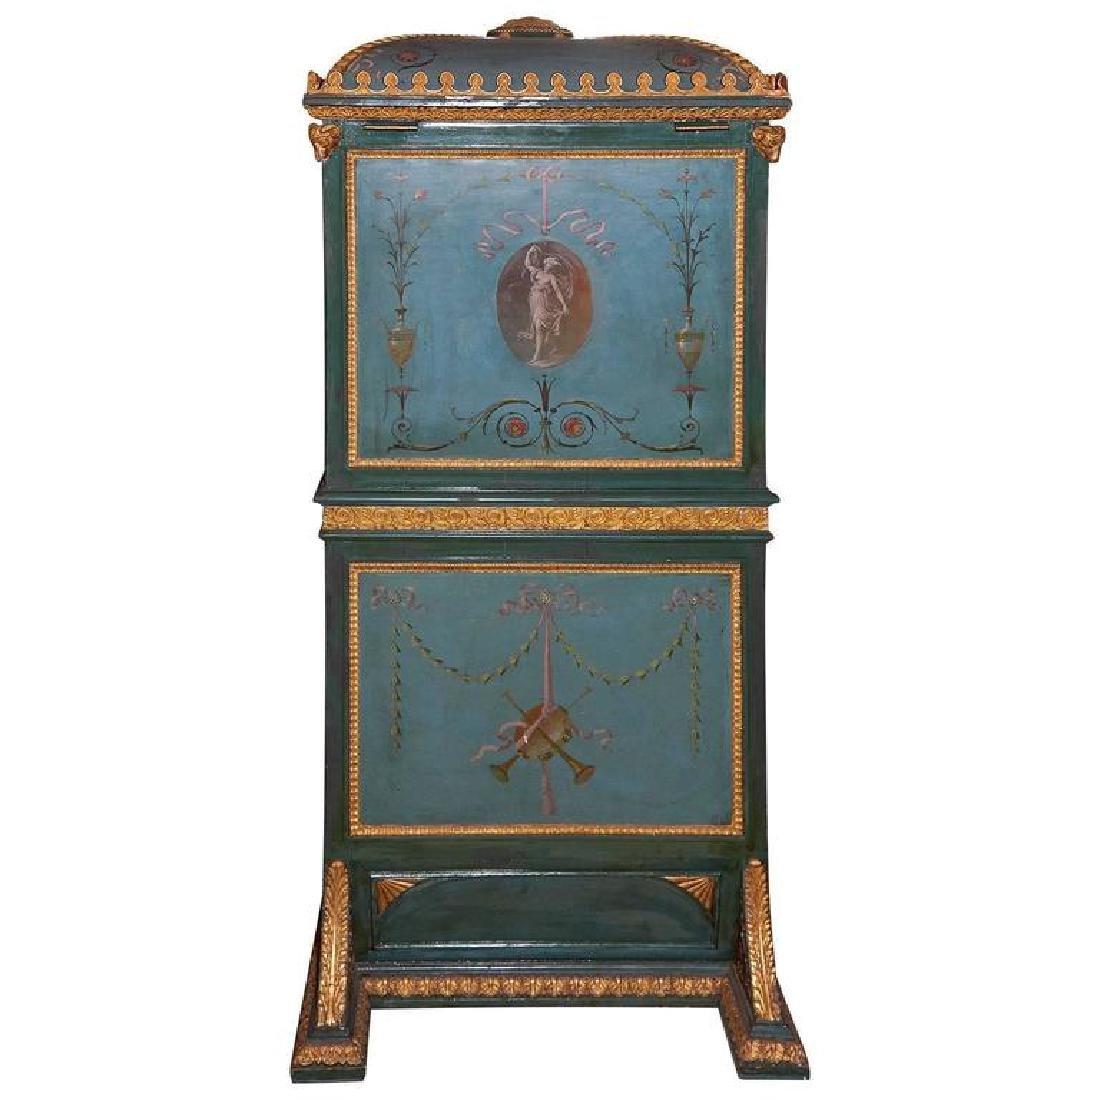 19th Century Venetian Giltwood Hand-Painted Sedan Chair - 2